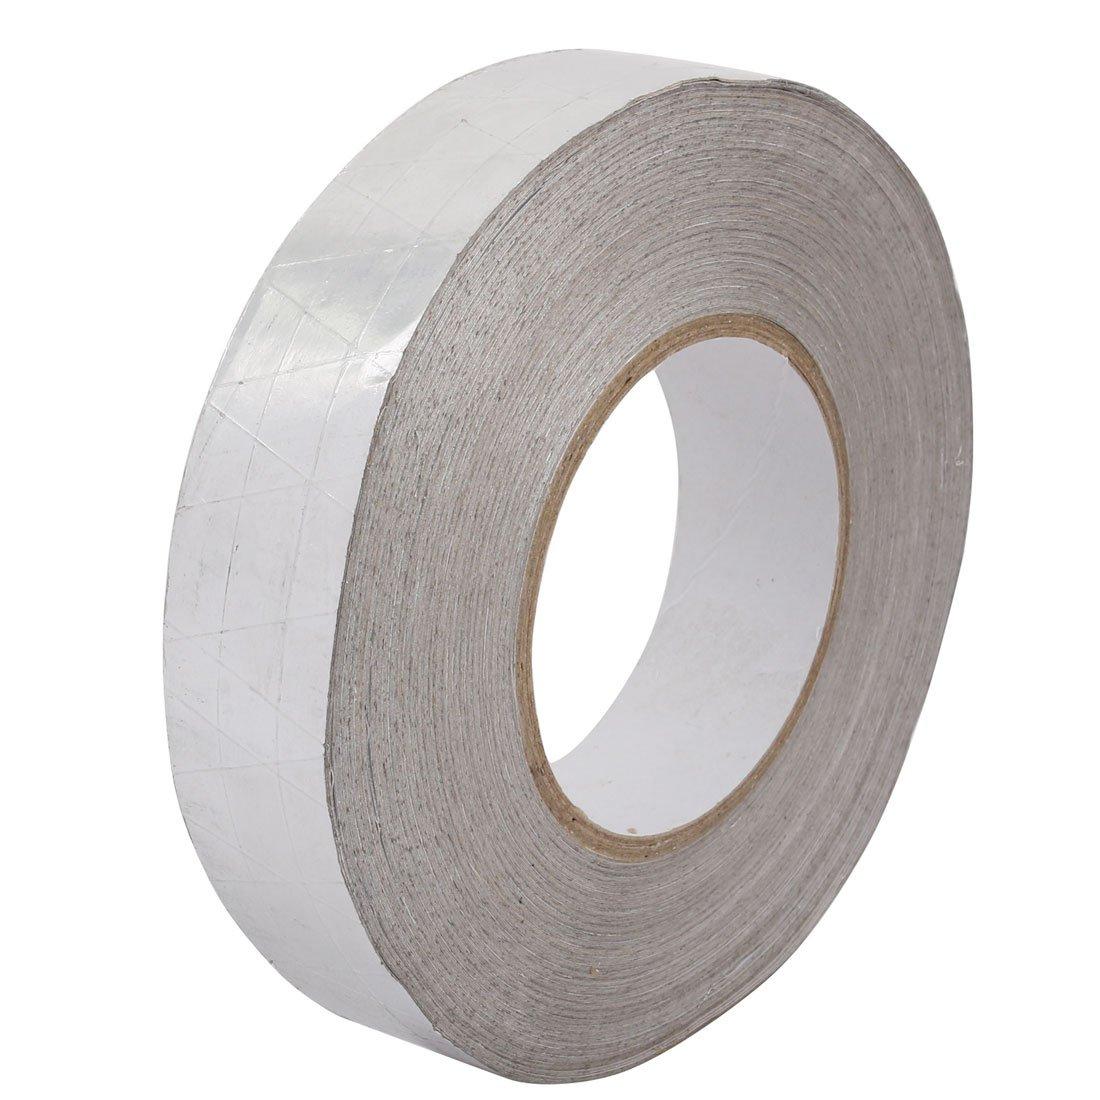 uxcell Aluminum Foil-Scrim-Kraft Insulation Jacketing Tape 50 Meter Length x 30mm Width